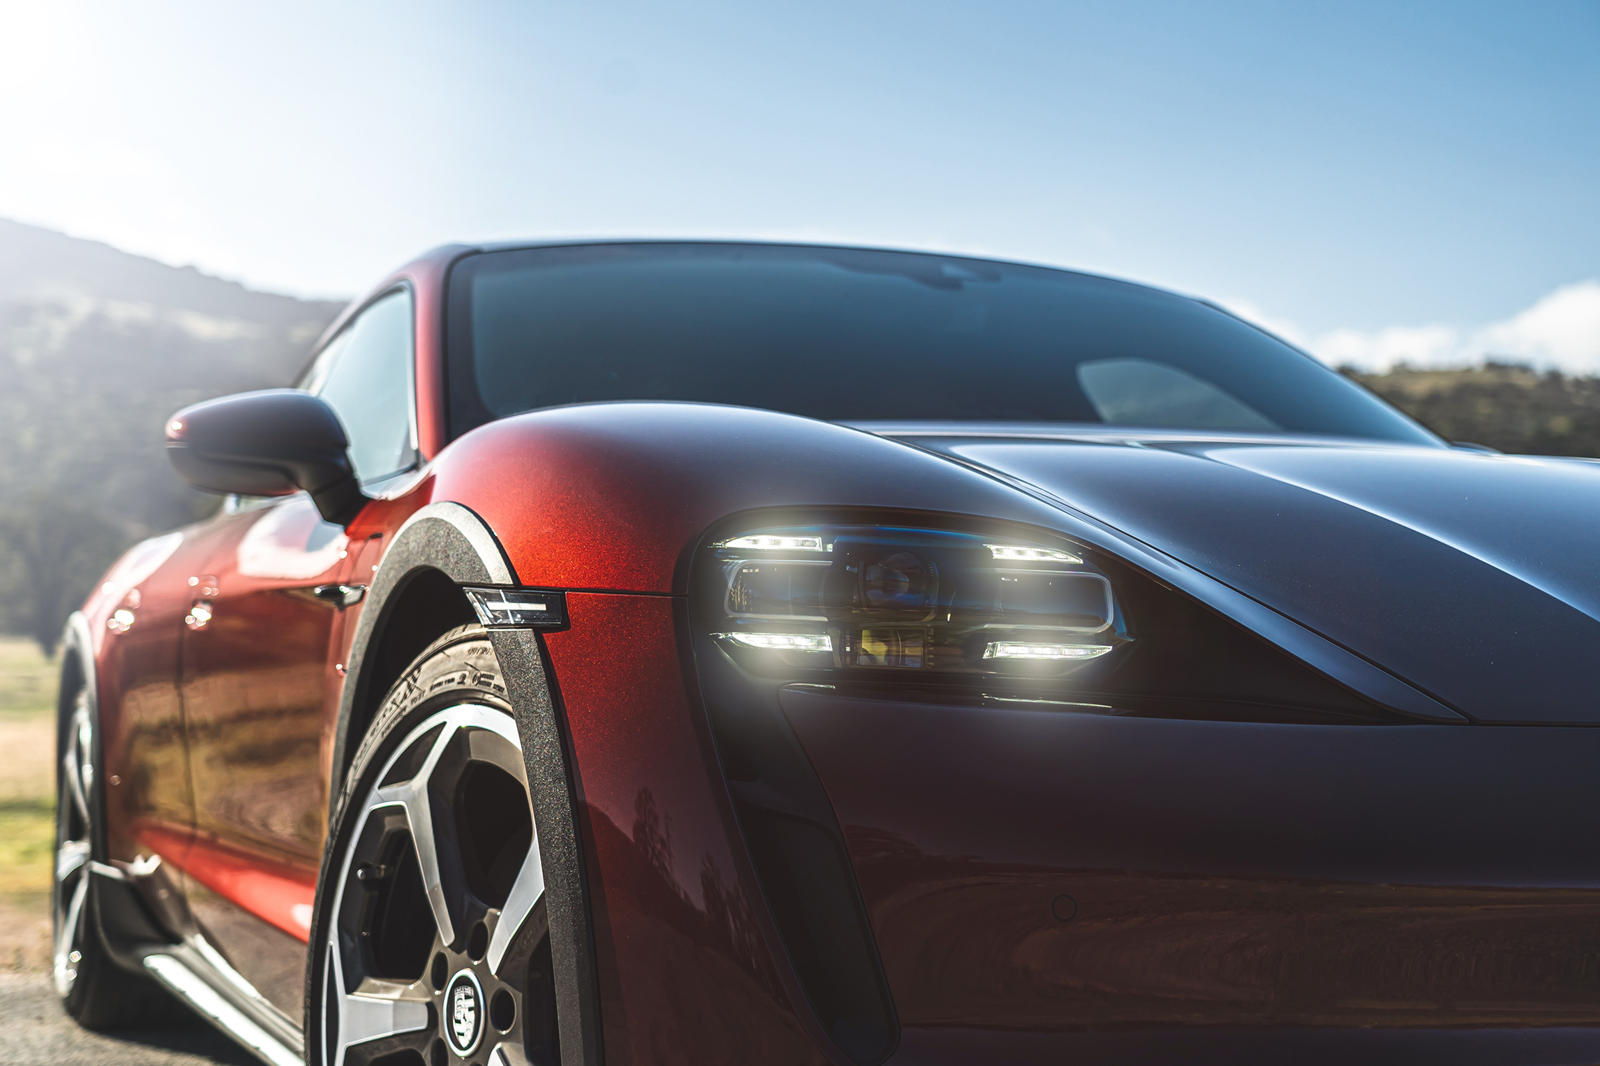 Volkswagen Big Shot Has Blunt Words About Self-Driving Cars